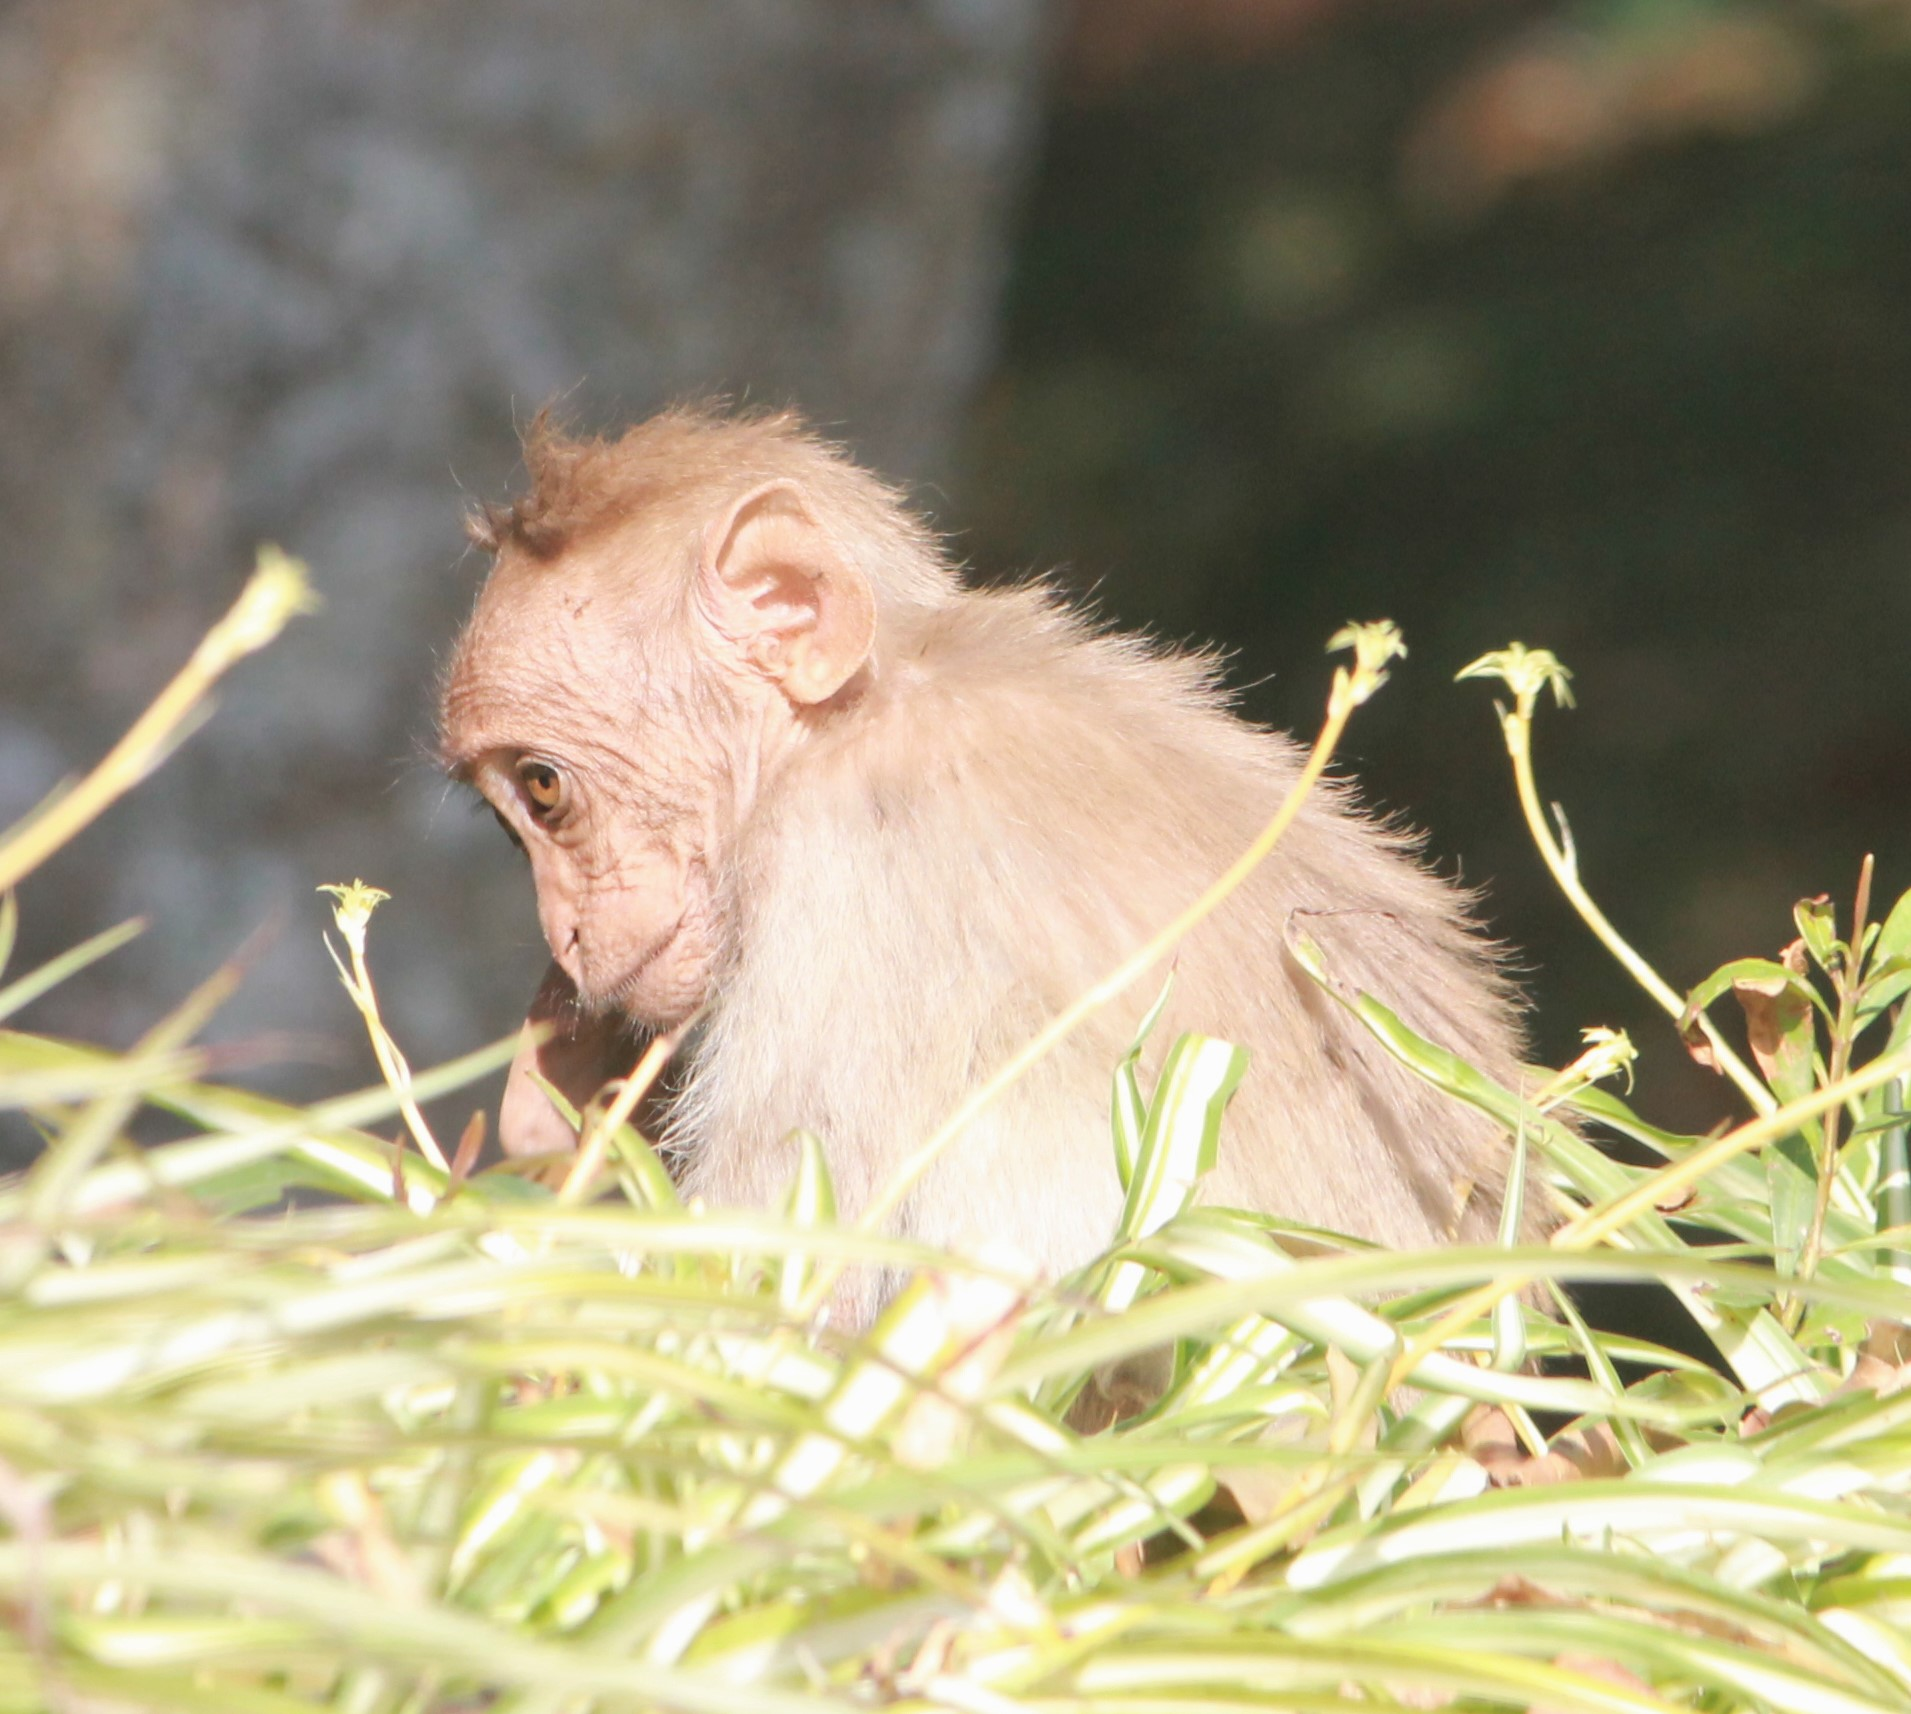 little monkey, sofspics